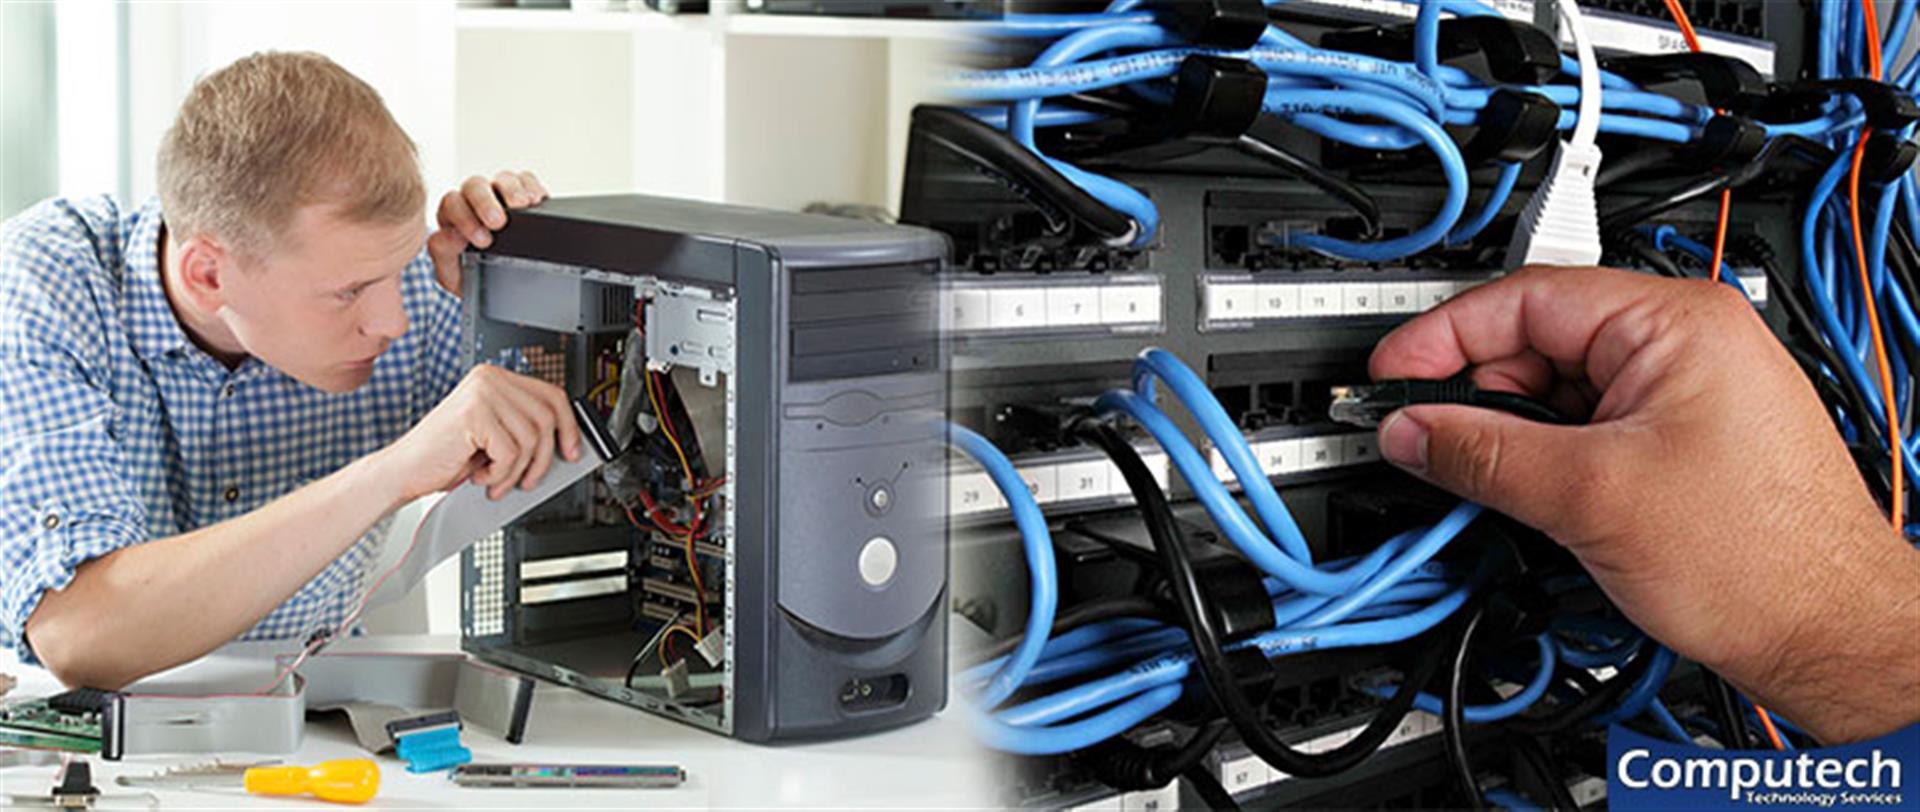 Hiram Georgia On Site PC & Printer Repair, Networks, Voice & Data Cabling Contractors